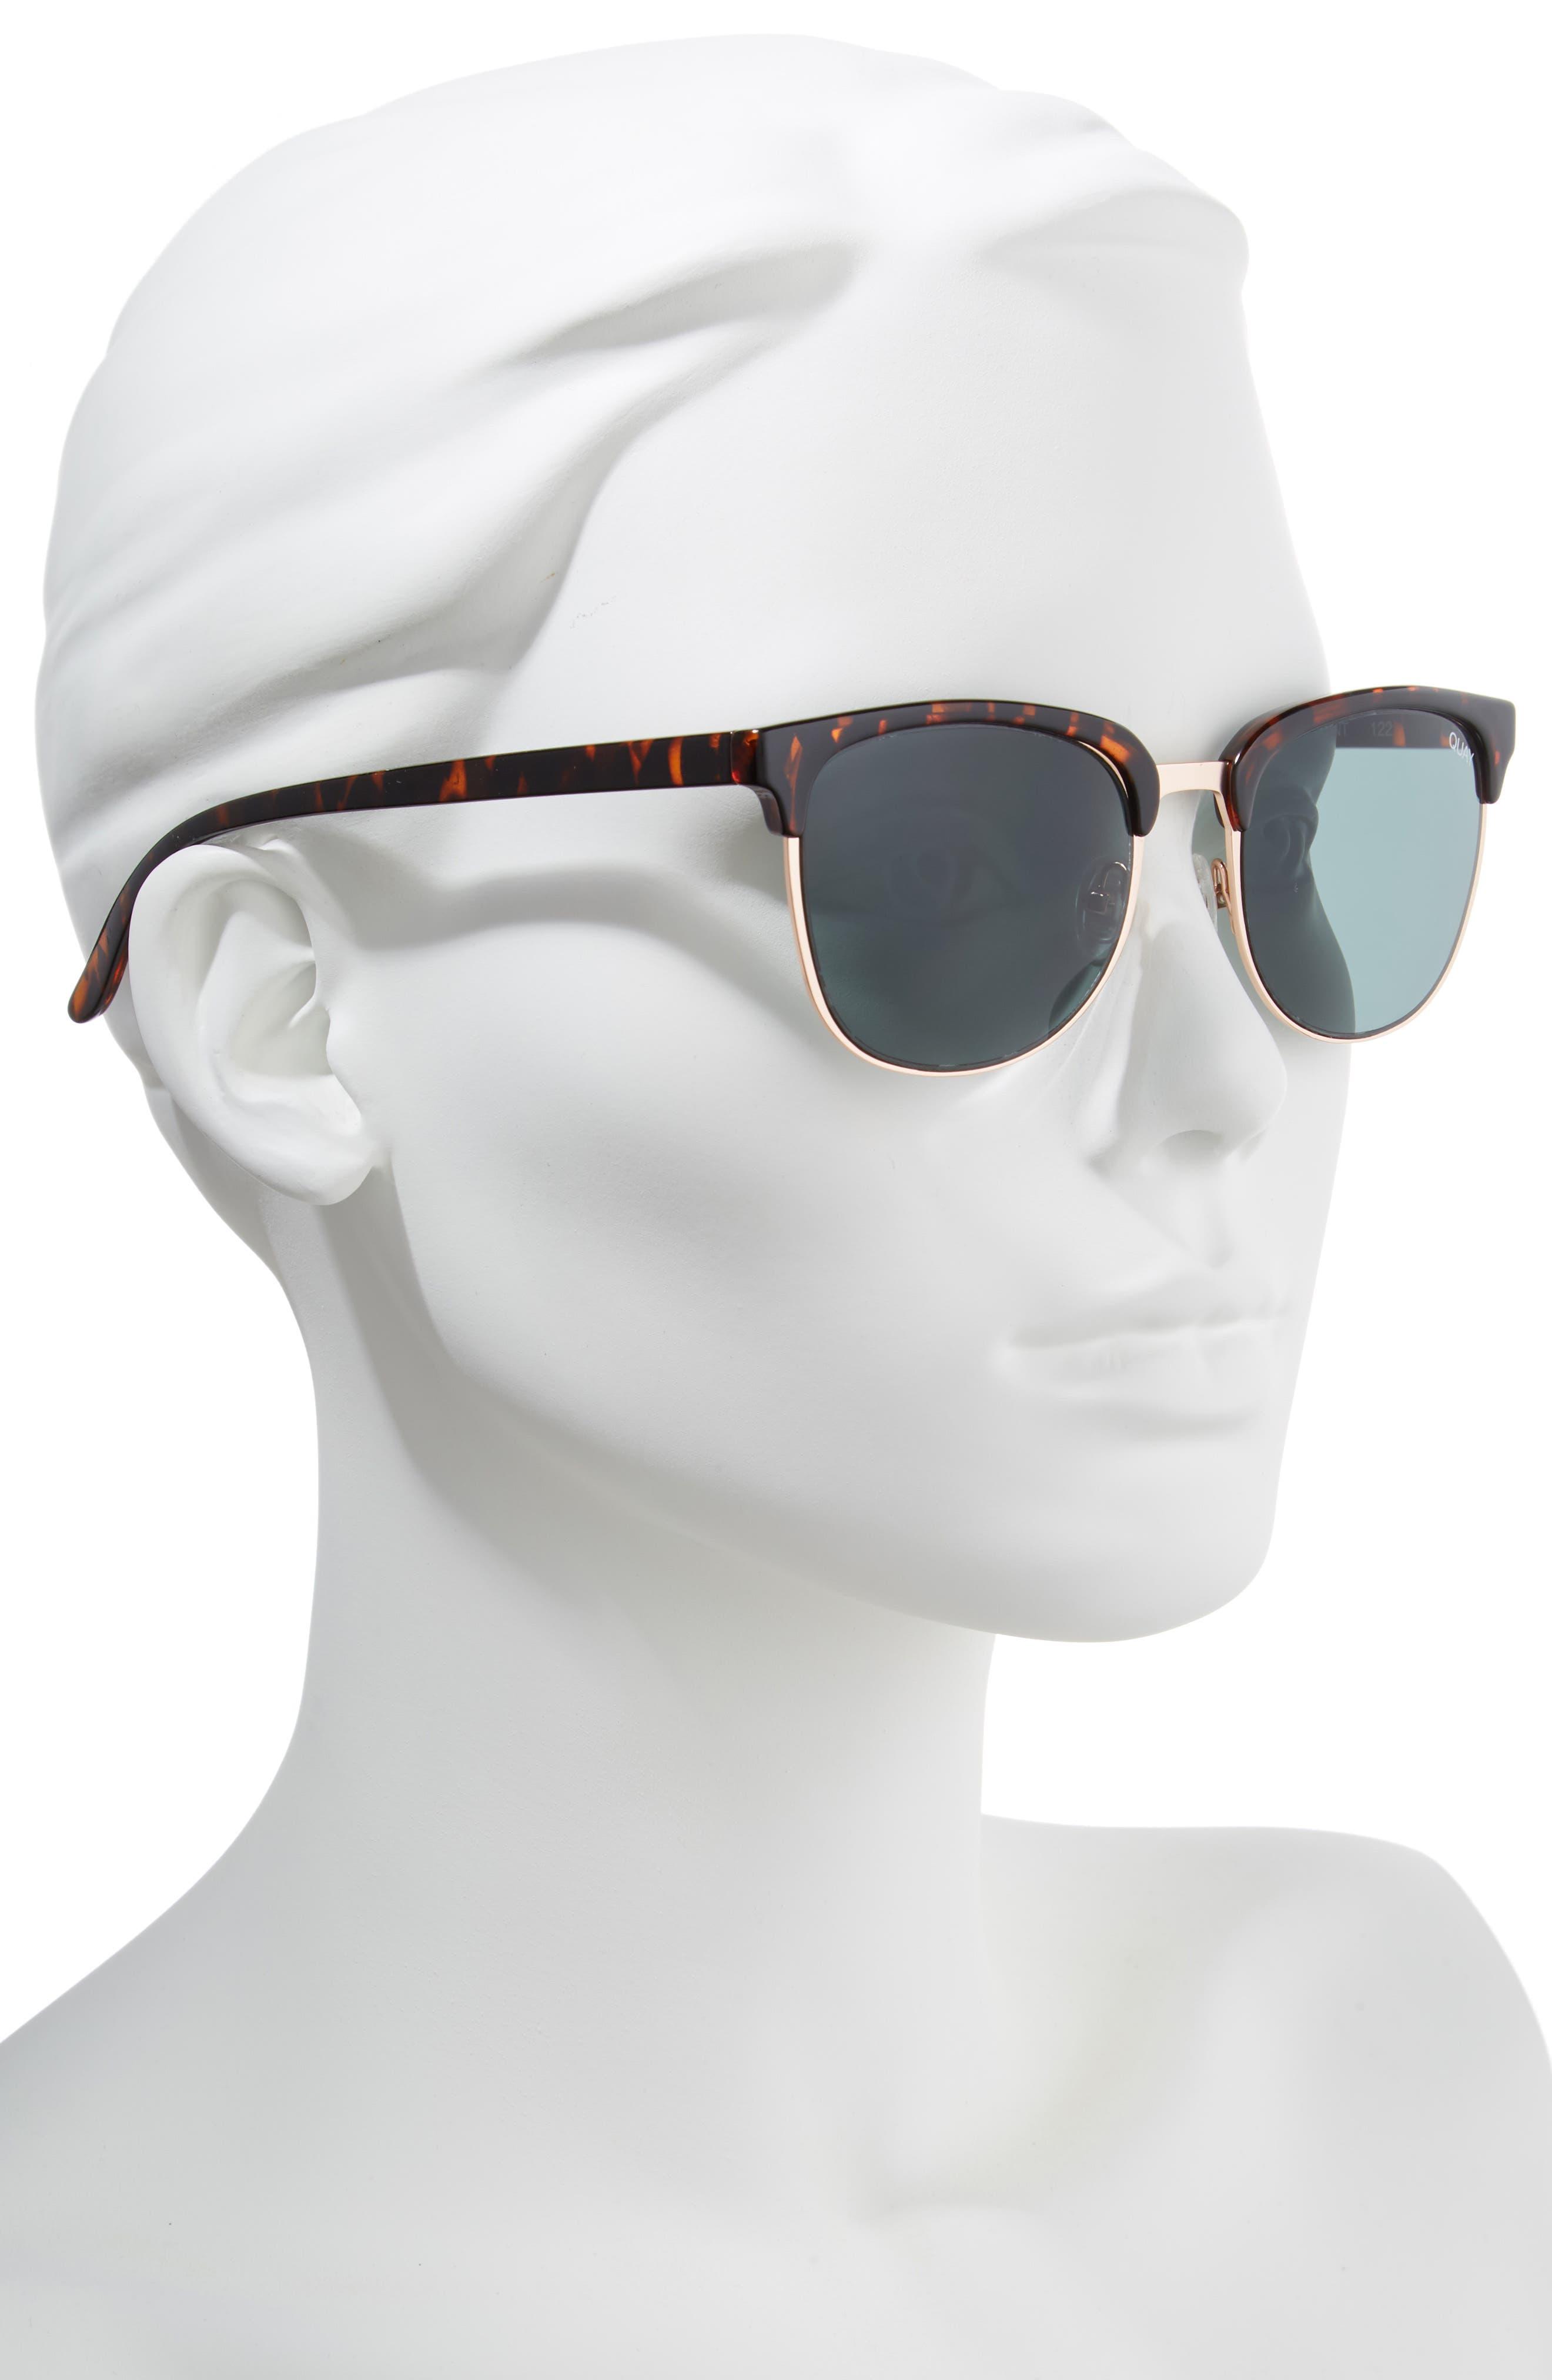 Flint 52mm Sunglasses,                             Alternate thumbnail 2, color,                             200